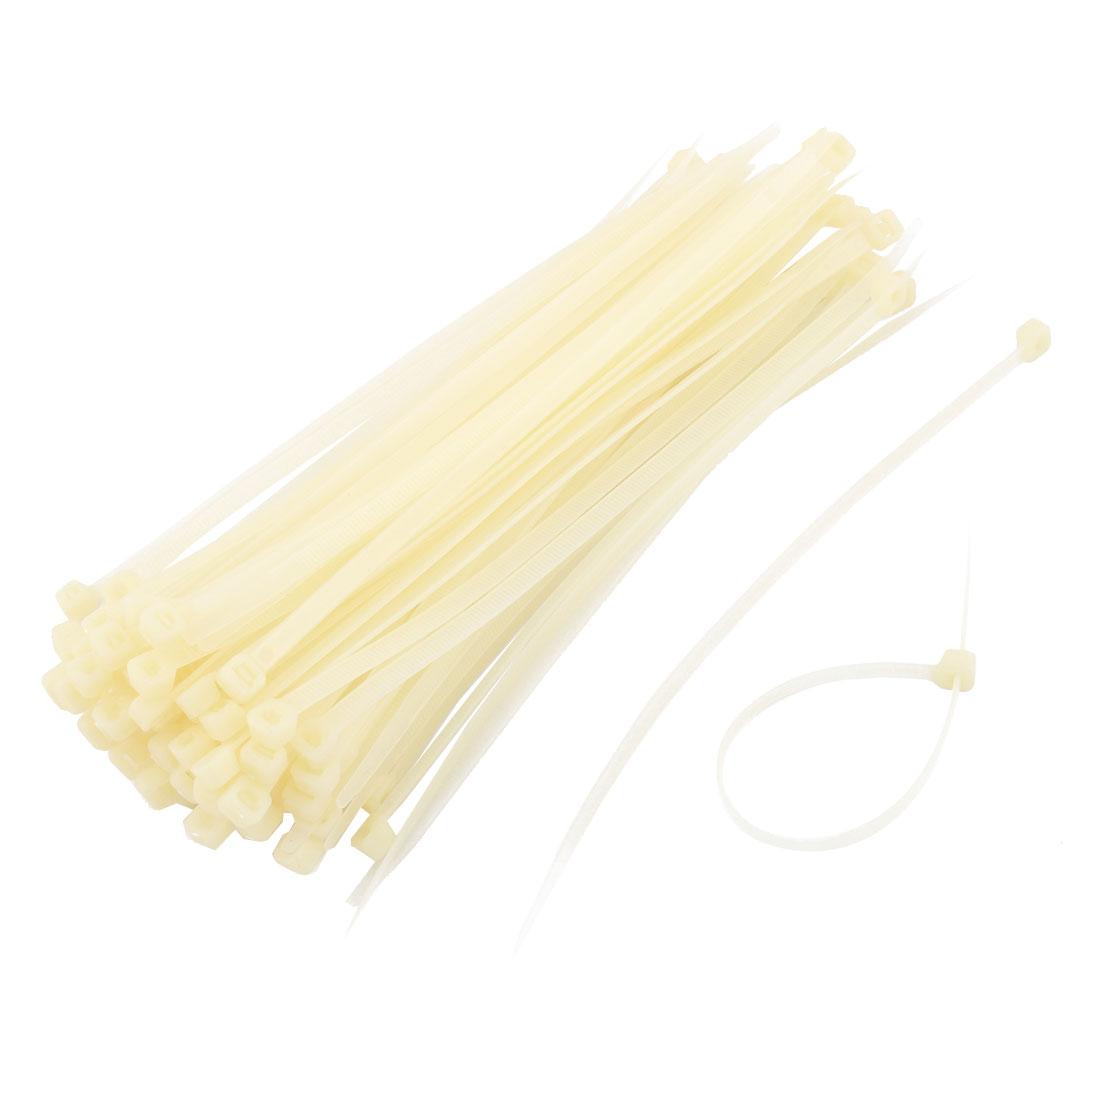 100pcs 198 x 5mm Plastic Self Locking Reusable Cable Zip Ties Fastener Beige - image 2 of 2